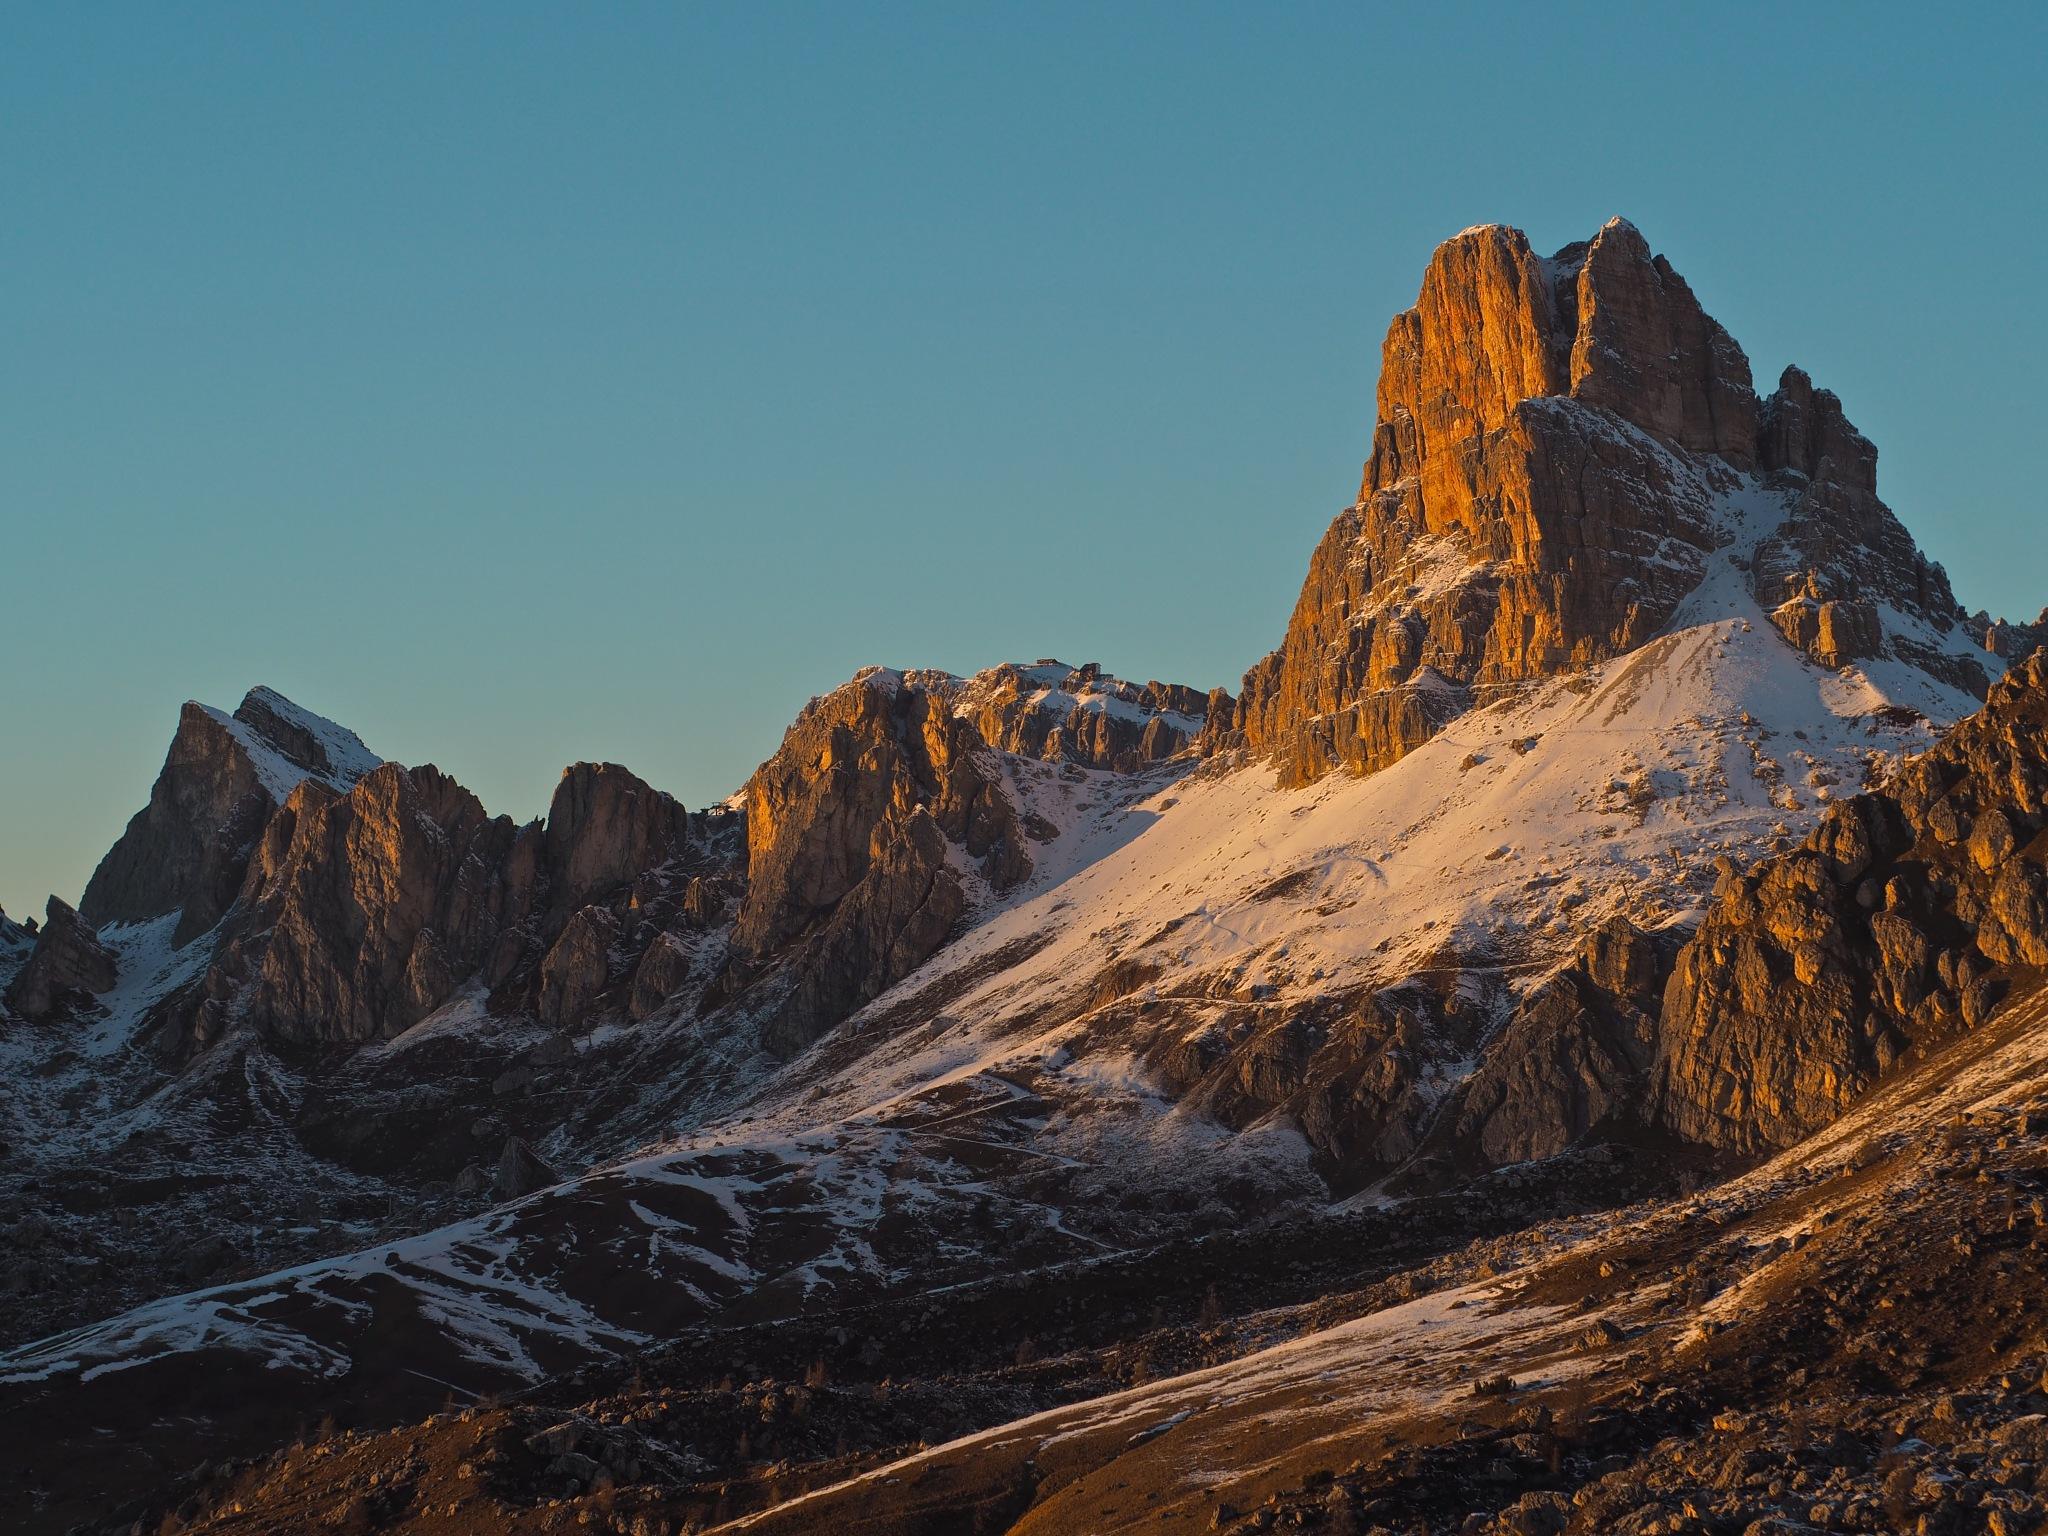 Mount Averau by Giancarlo Cappellari